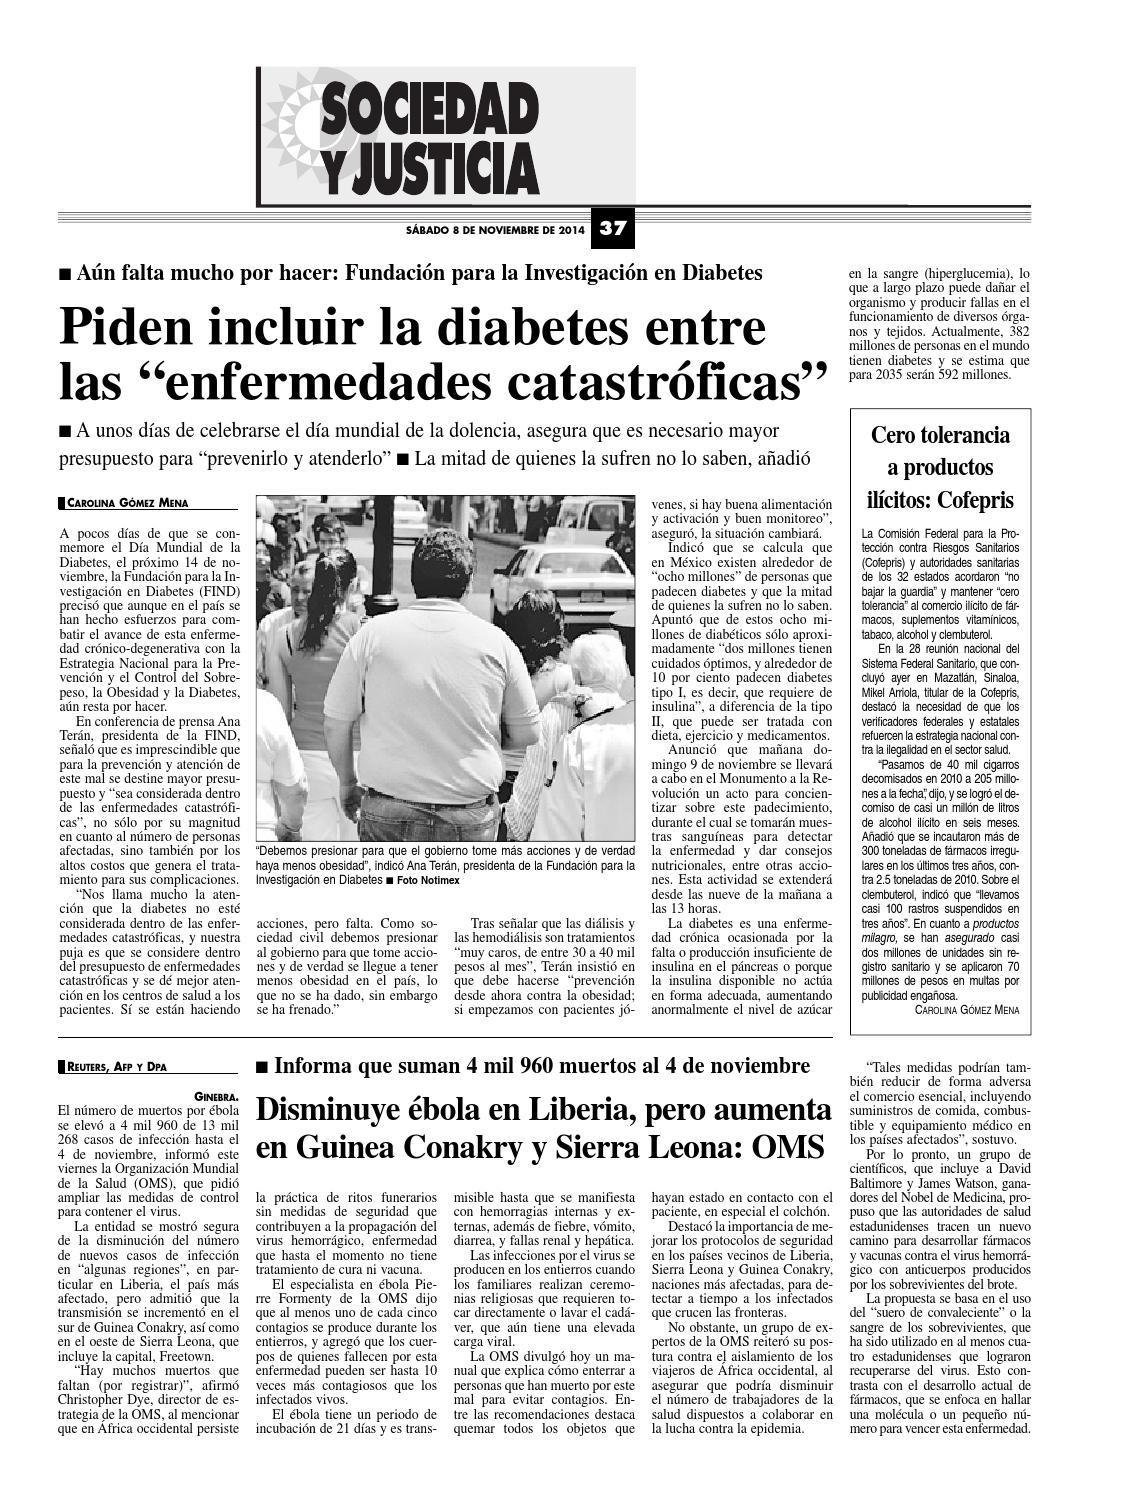 fundación de investigación de diabetes